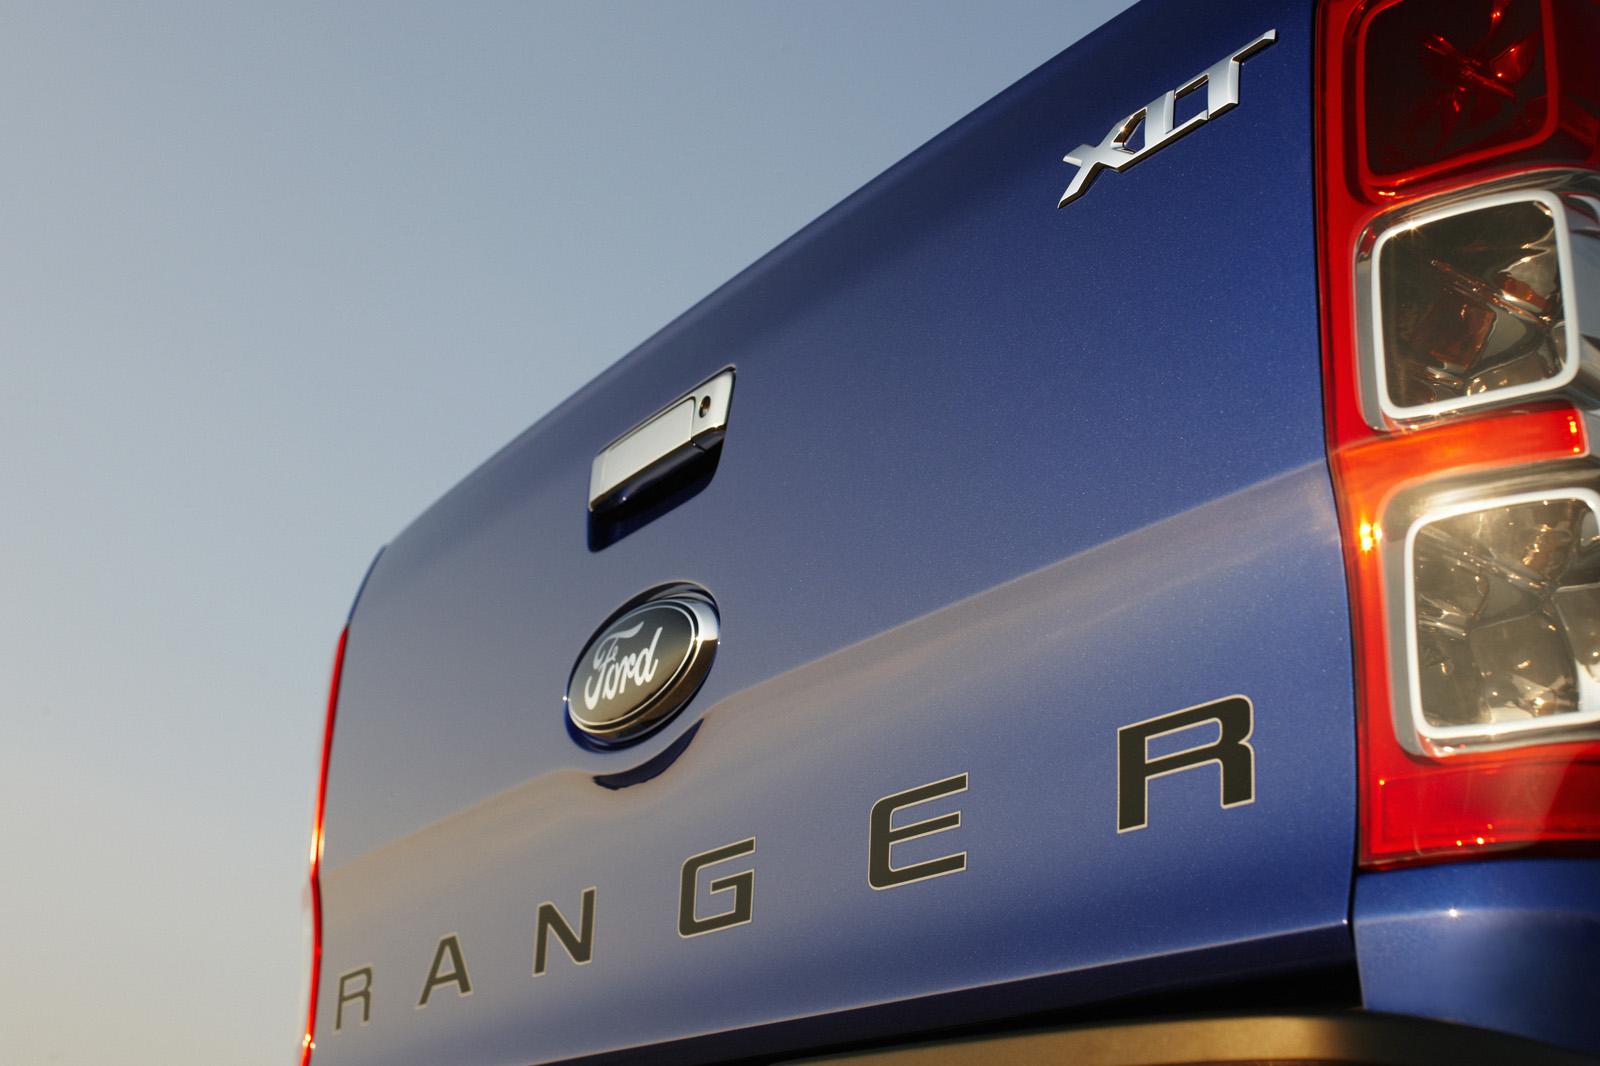 http://1.bp.blogspot.com/_J3_liDBfbvs/TLsEt9AY6DI/AAAAAAAAzBc/FfgIGs9SinA/s1600/2011+Ford+Ranger+Emblem+Photo.jpg